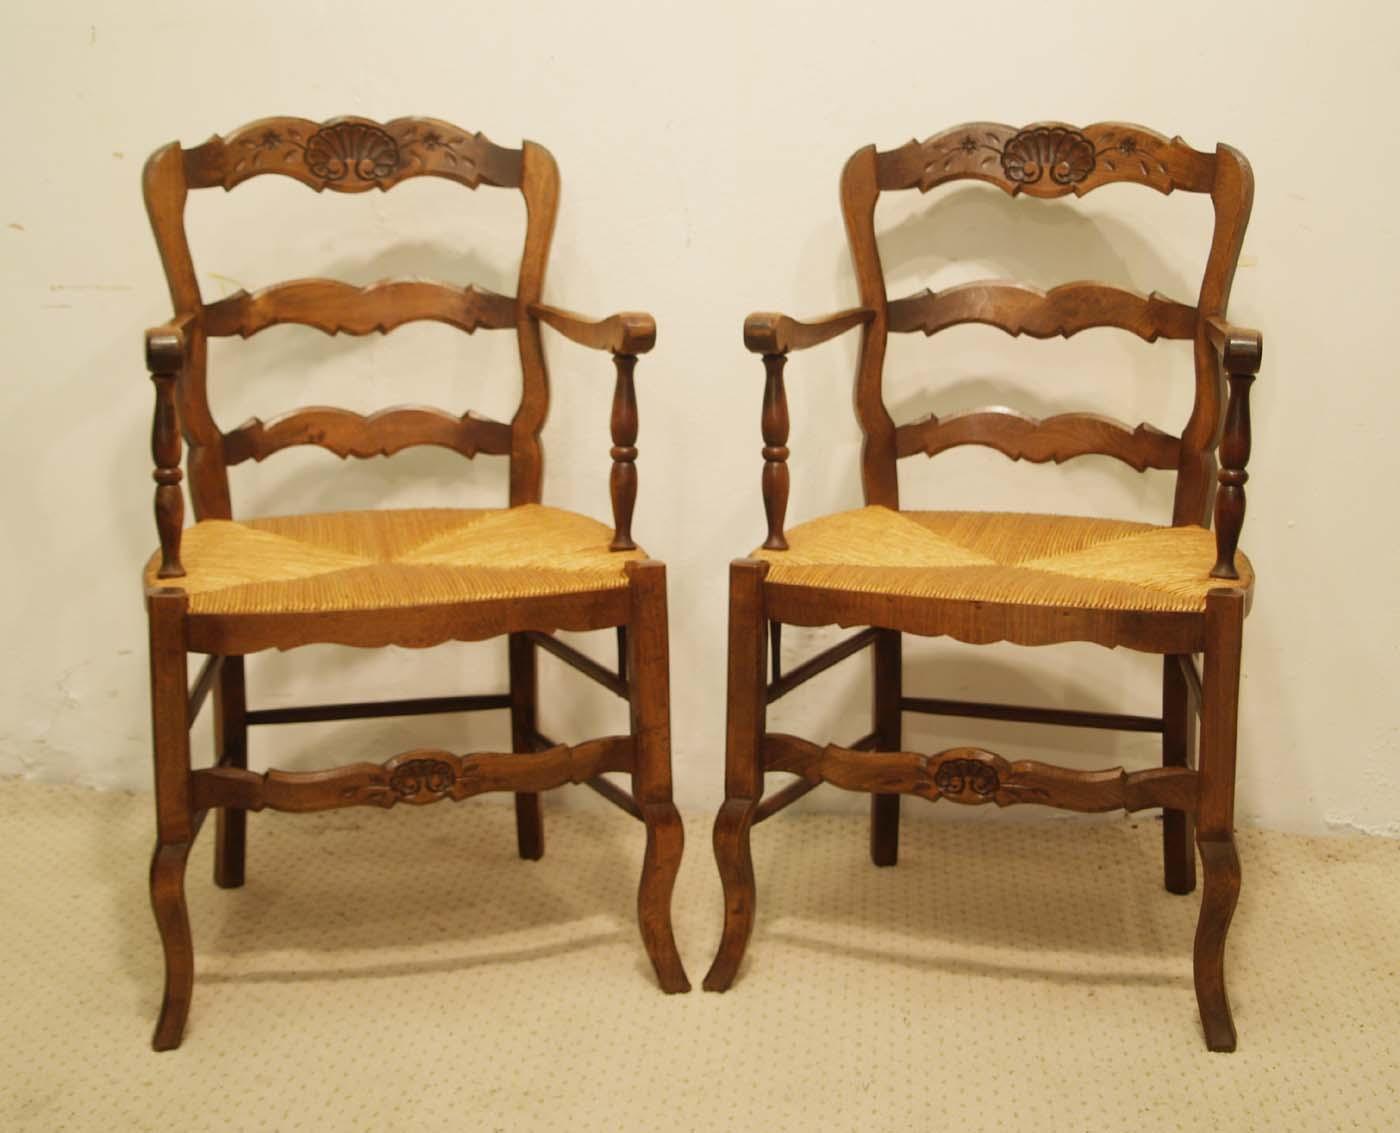 Pair French vintage fauteuils 1